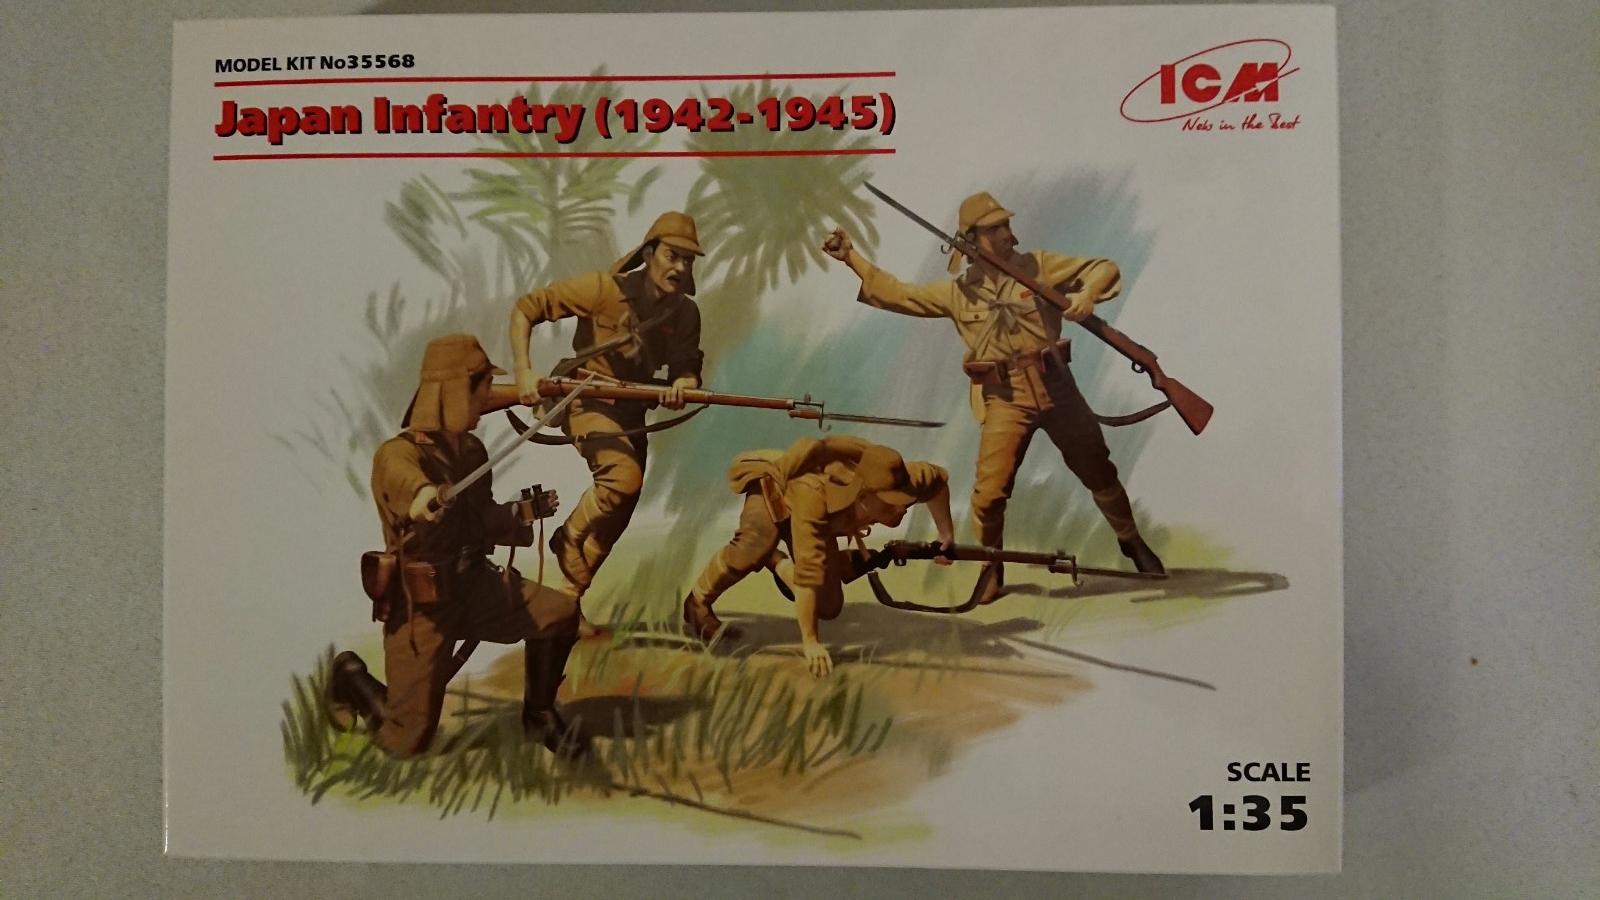 Japan Infantry ( 1942-1945) ICM 35568